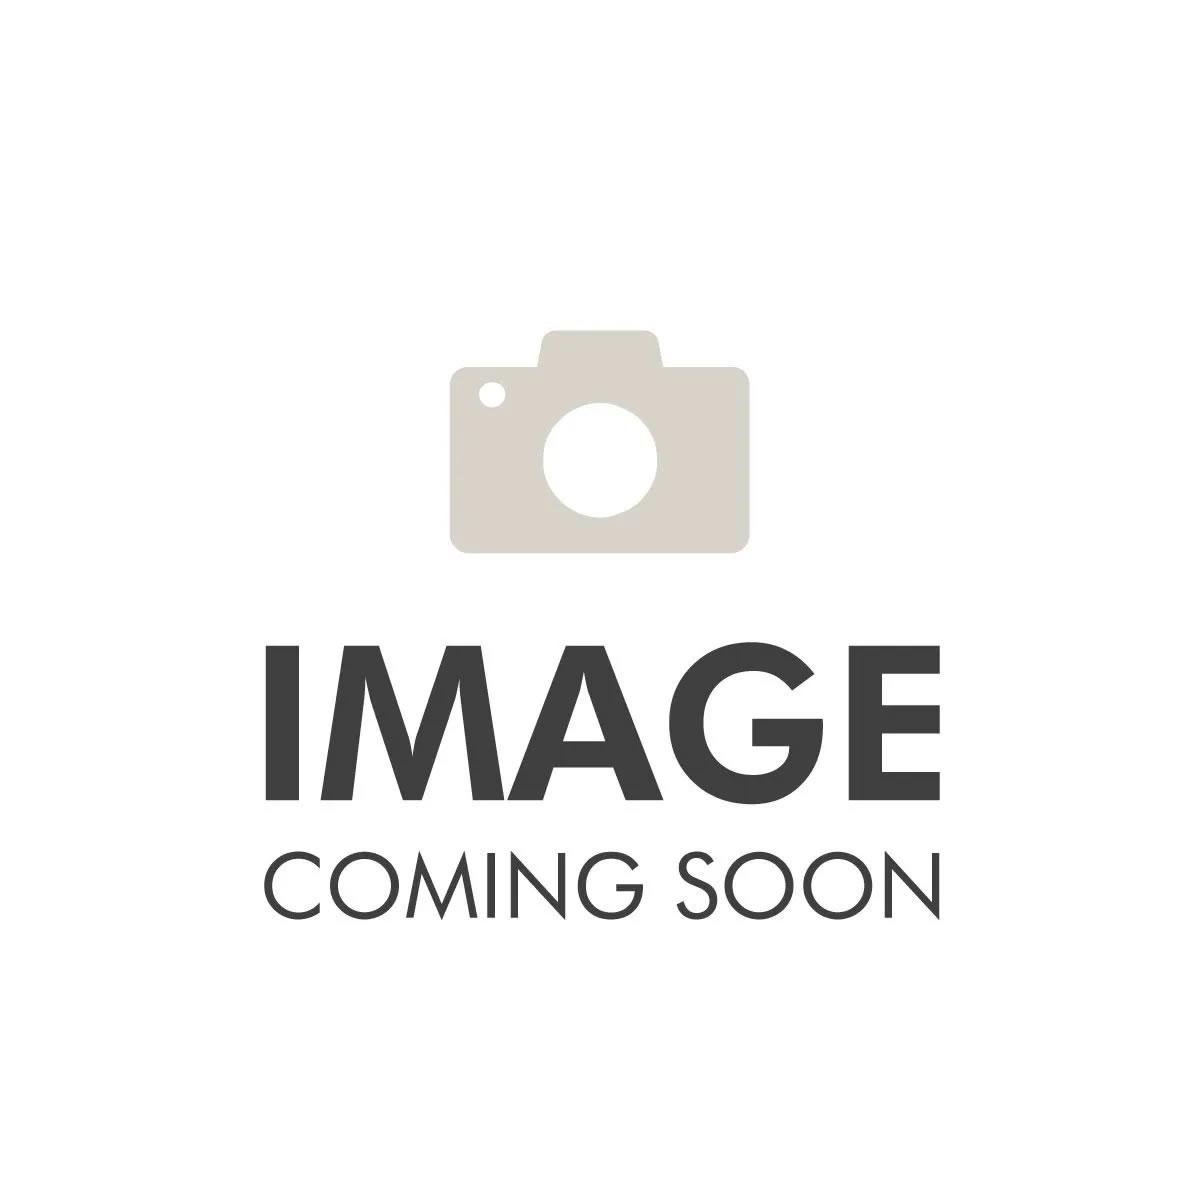 Pocket Brief Top, Khaki Diamond; 97-06 Jeep Wrangler TJ